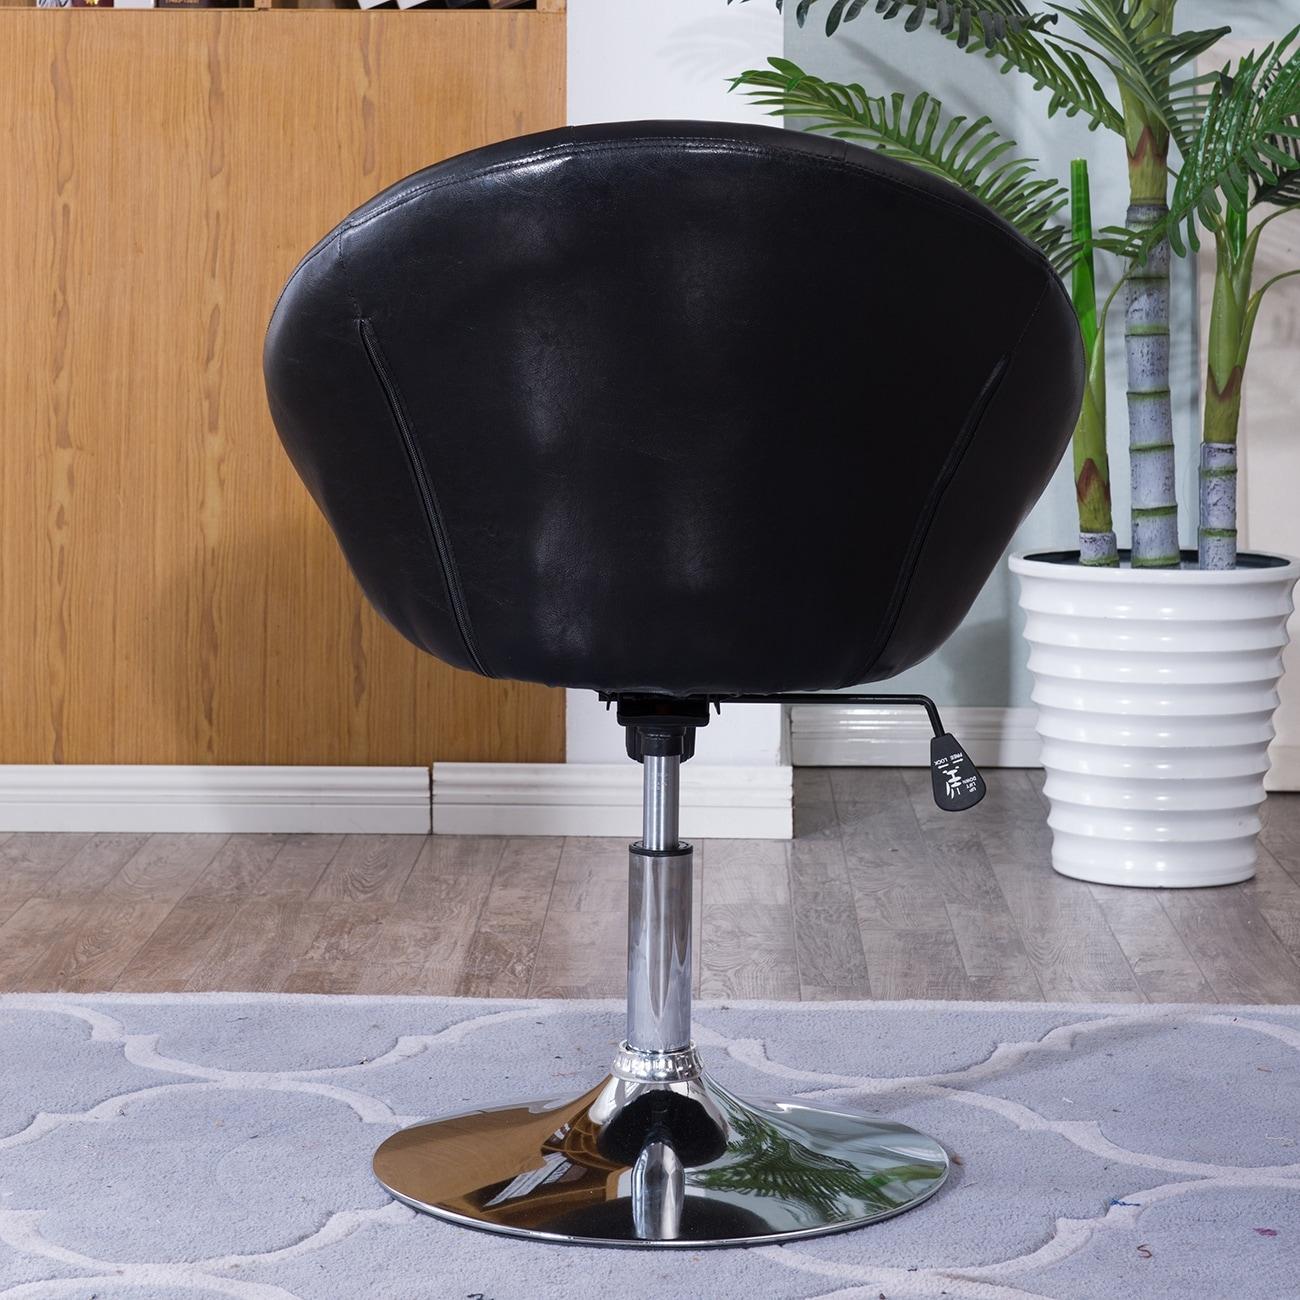 Belleze Round Tufted Back Tilt Adjustable Swivel Accent Chair Hydraulic Lift Chrome Base Black